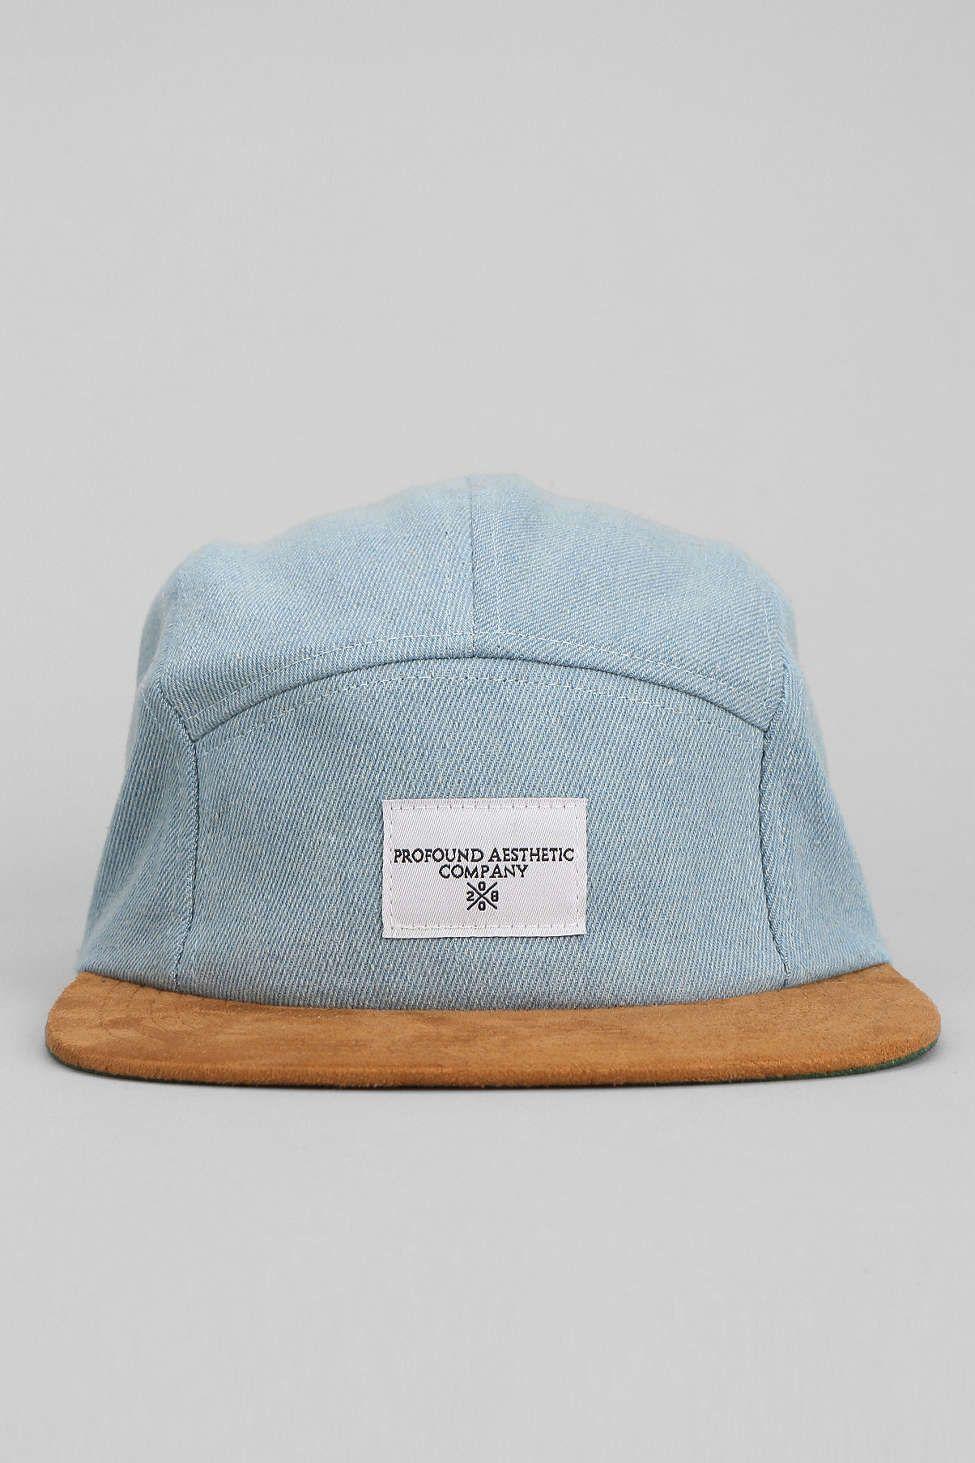 Profound Aesthetic X UO Washed Denim Strapback Hat  f4e1228c8b7